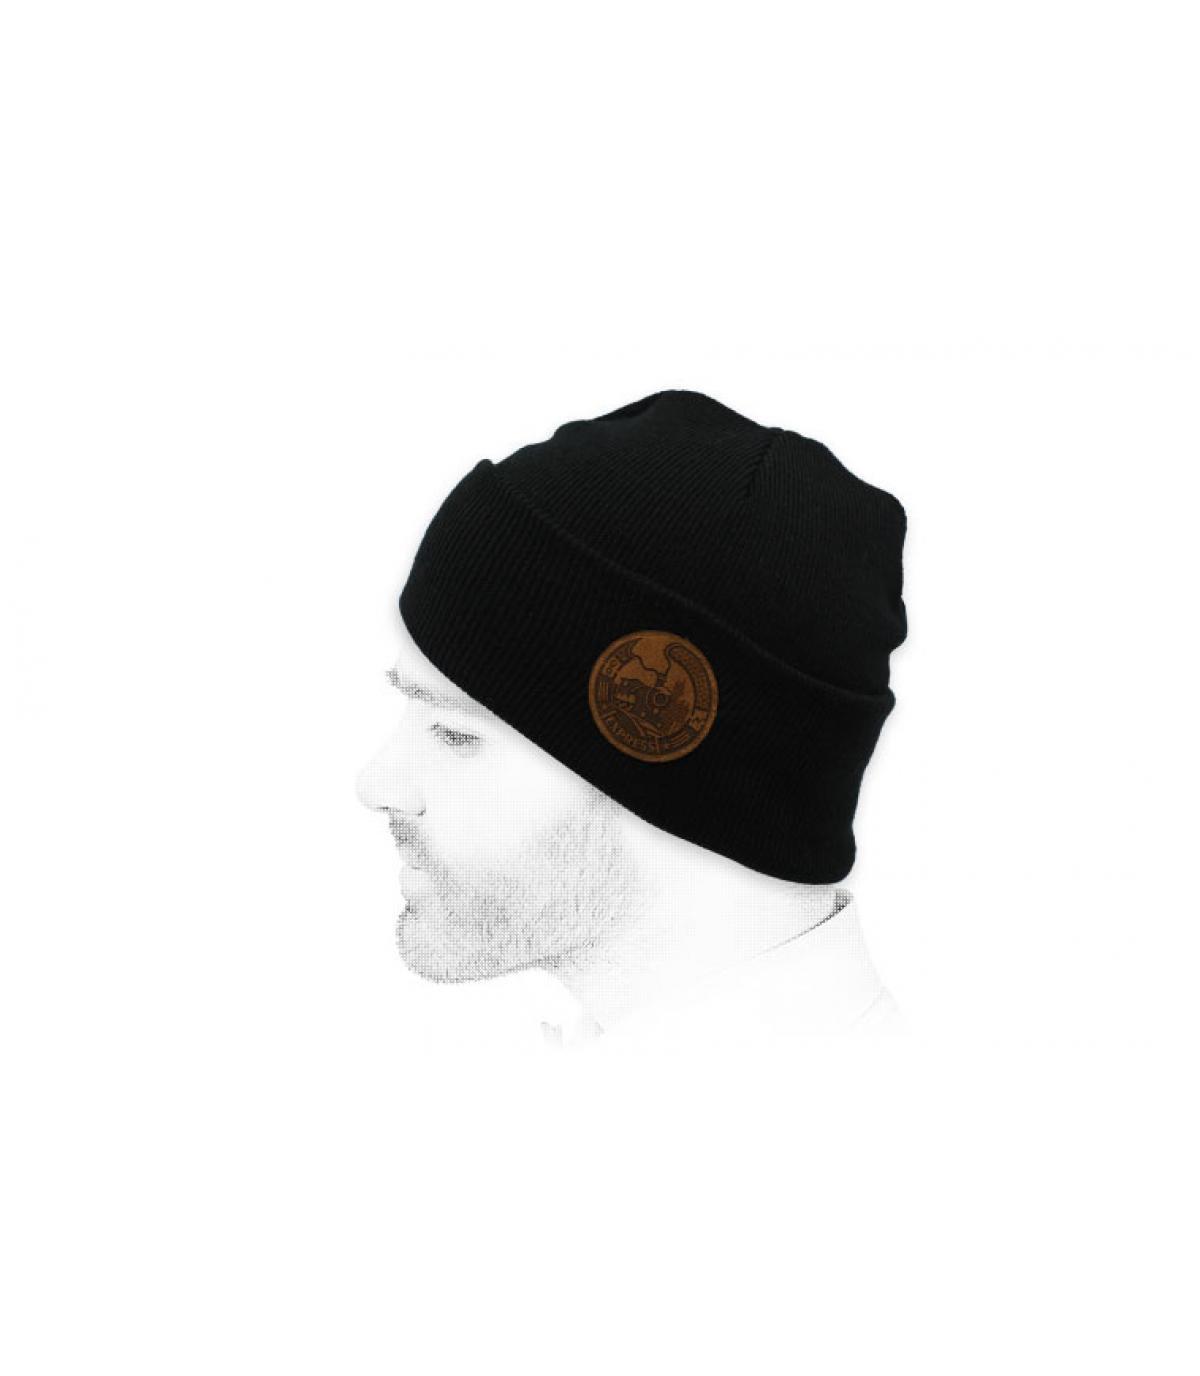 zwarte sneltrein hoed